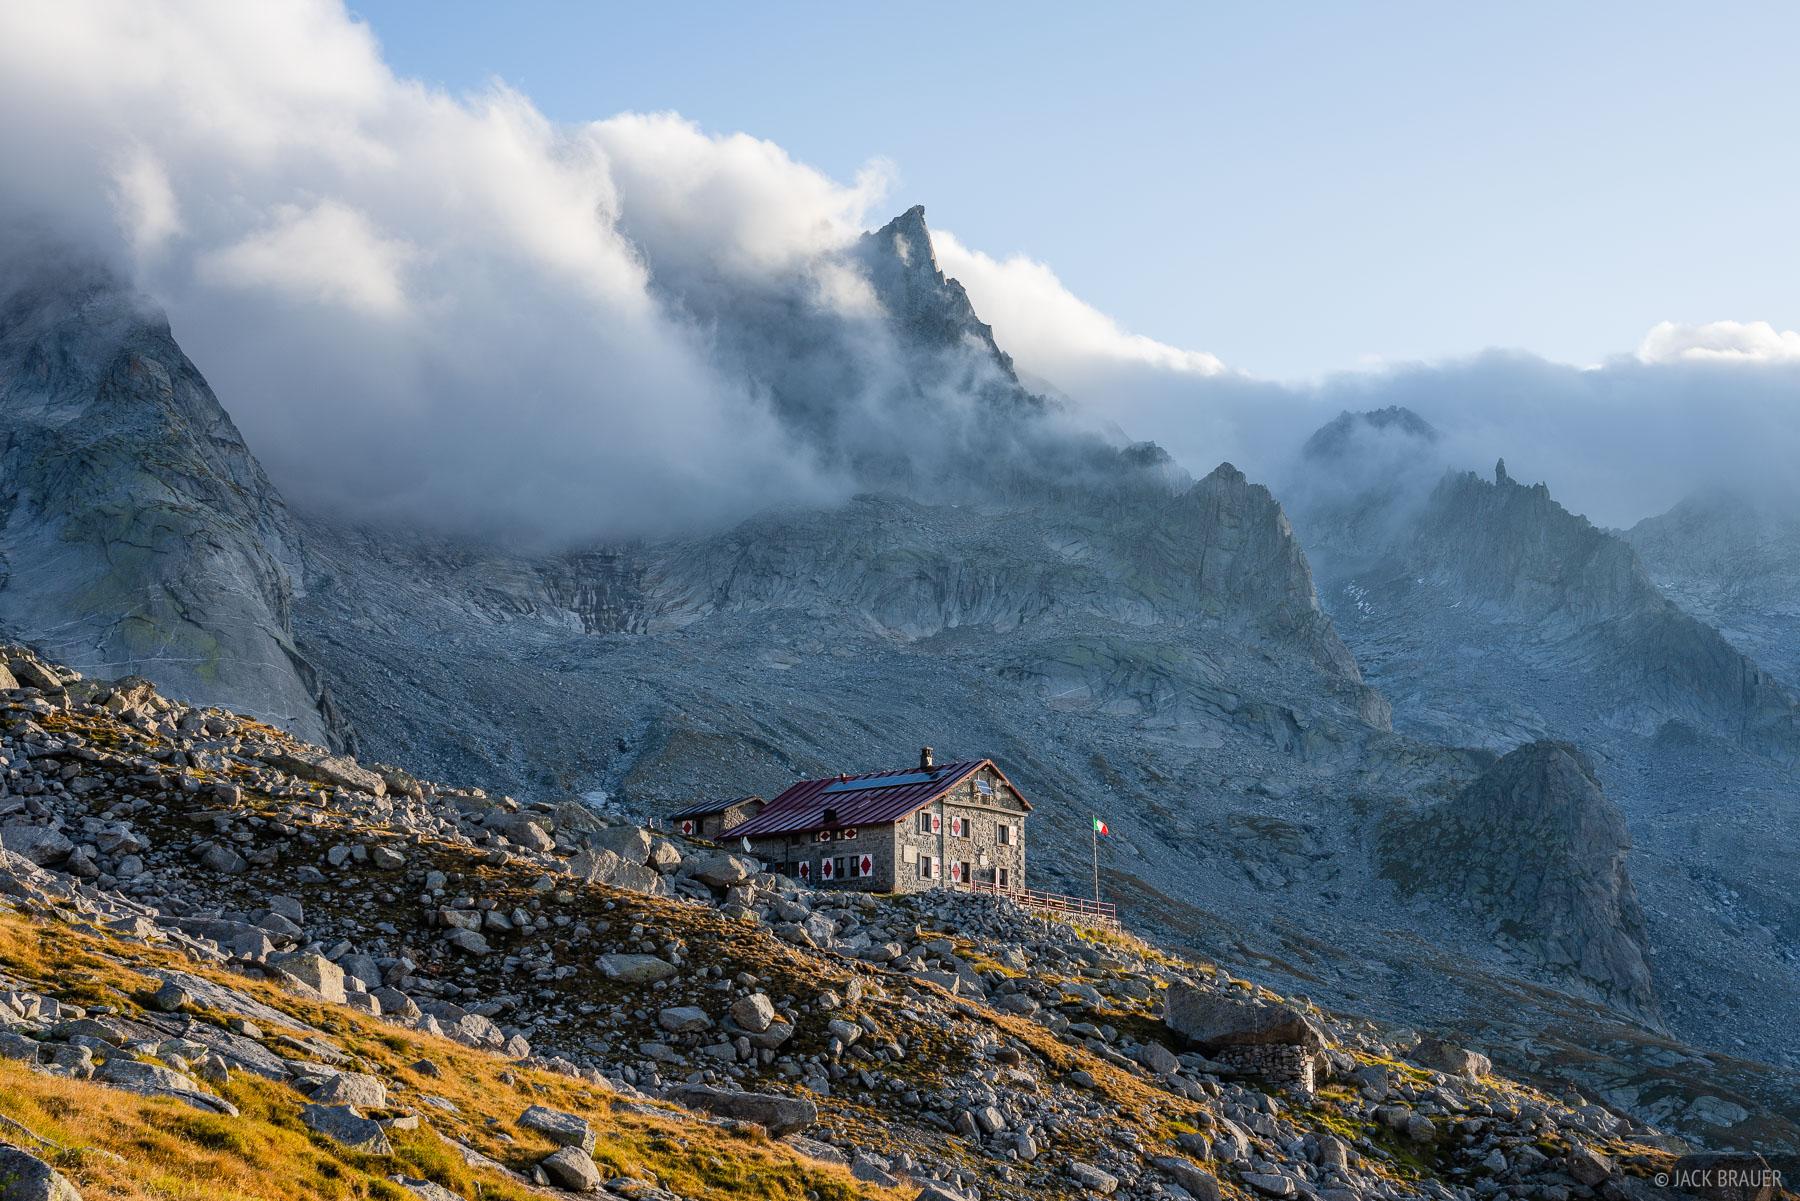 Italy, Pizzo Cengalo, Rhaetian Alps, Rifugio Gianetti, Val Masino, Valle Porcellizzo, hut